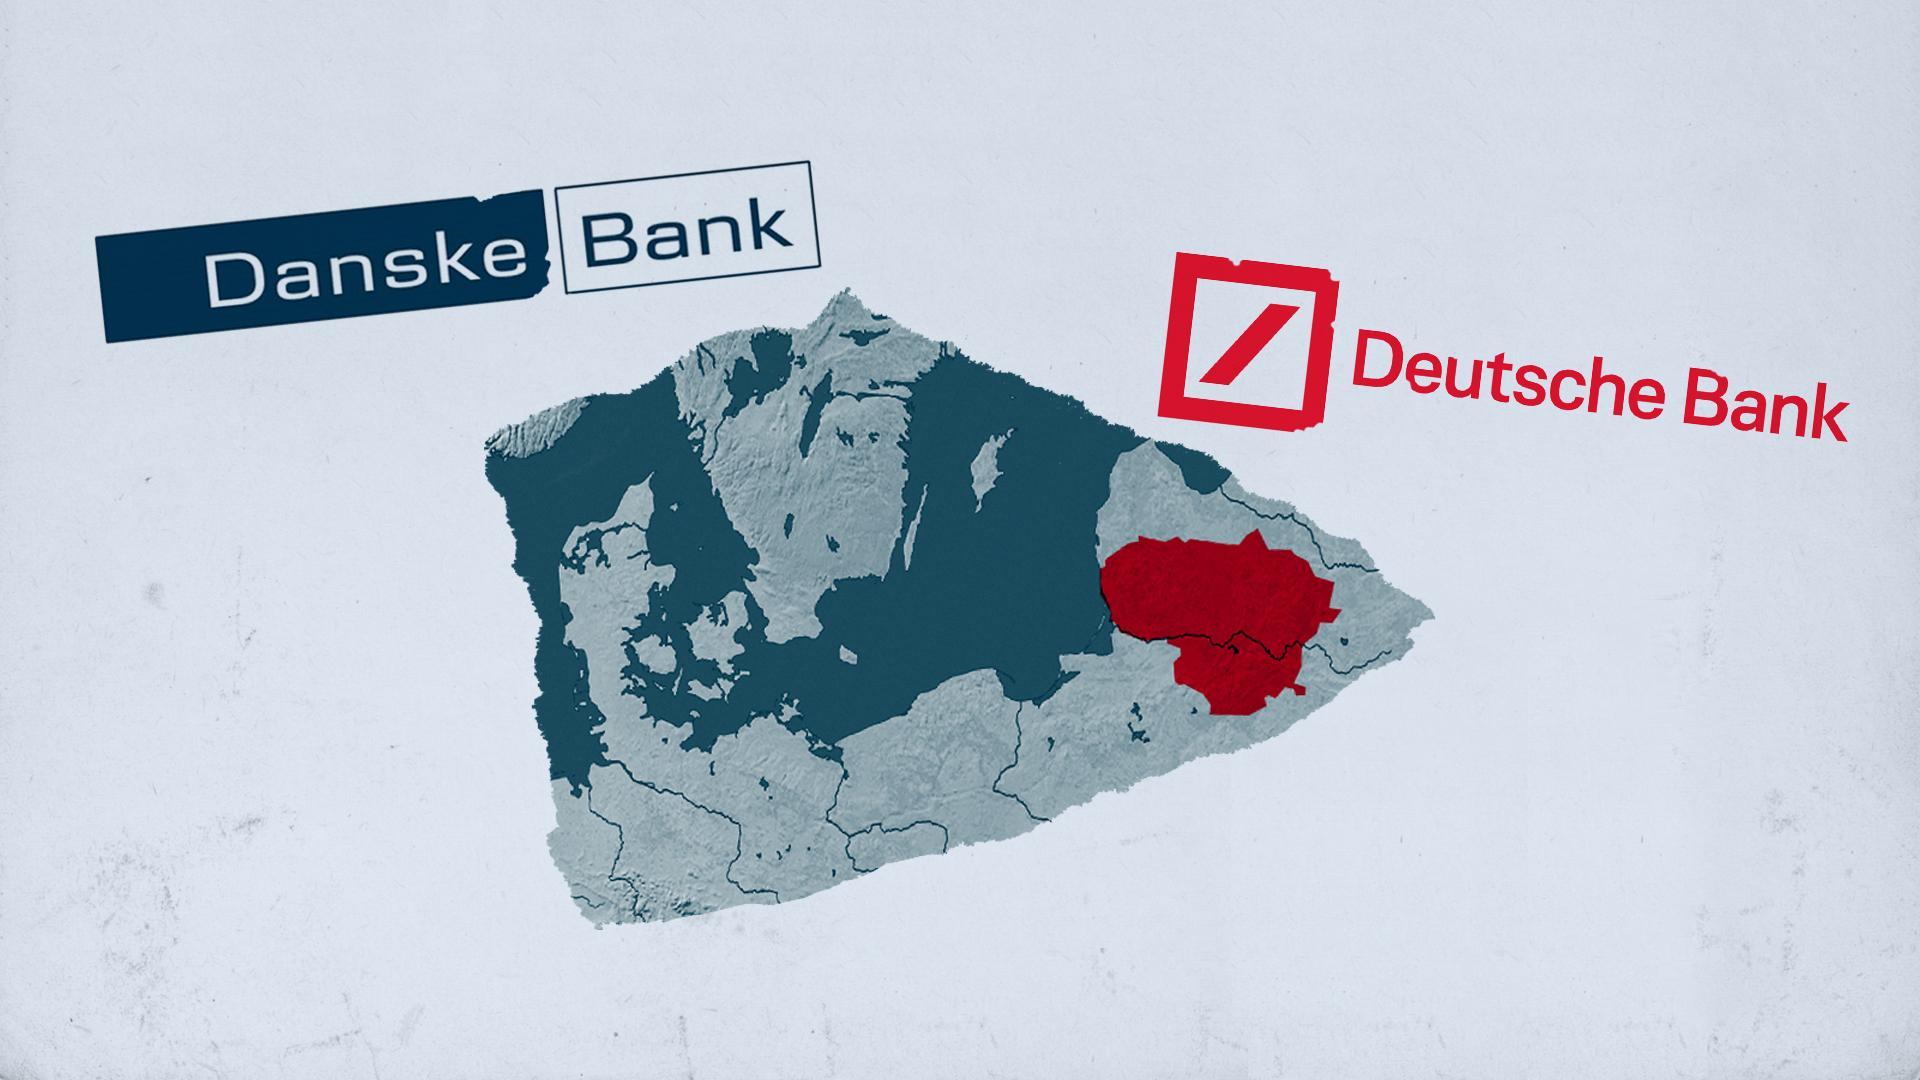 danskebank_litauen.jpg